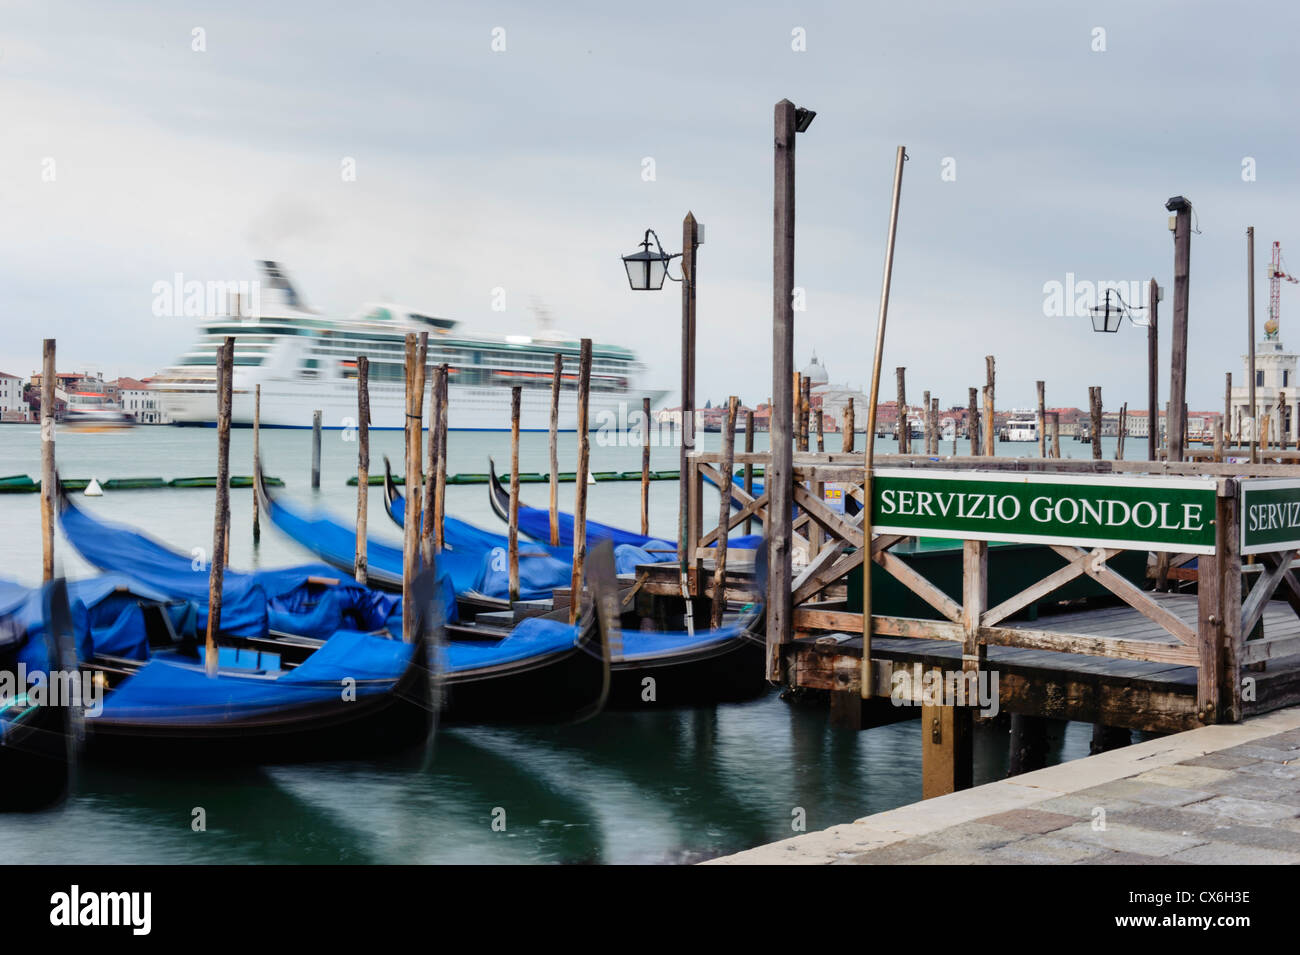 Big cruise ship enters the Saint Mark's basin before sunrise, Venice, Italy. - Stock Image